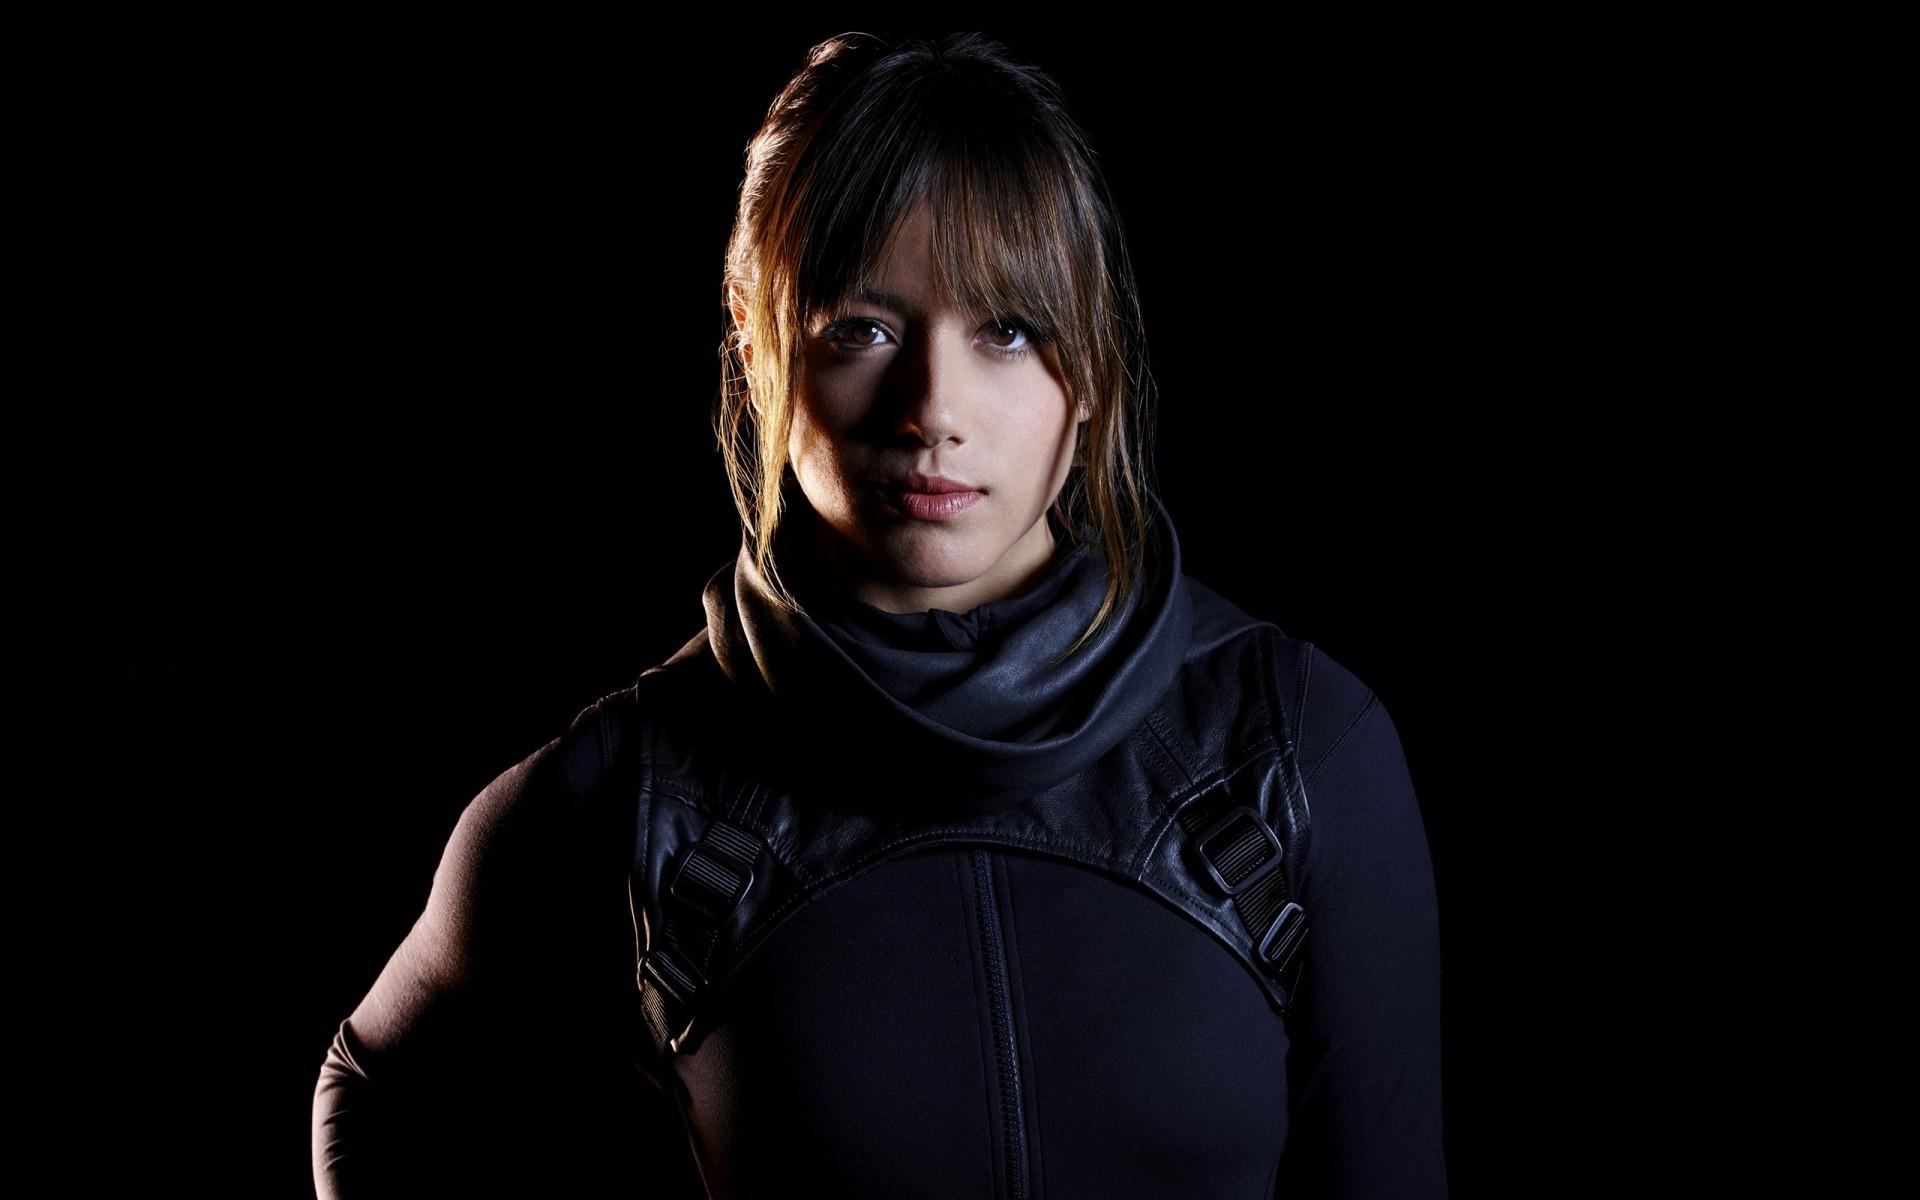 Tags: Daisy Johnson, Chloe Bennet, Agents of SHIELD